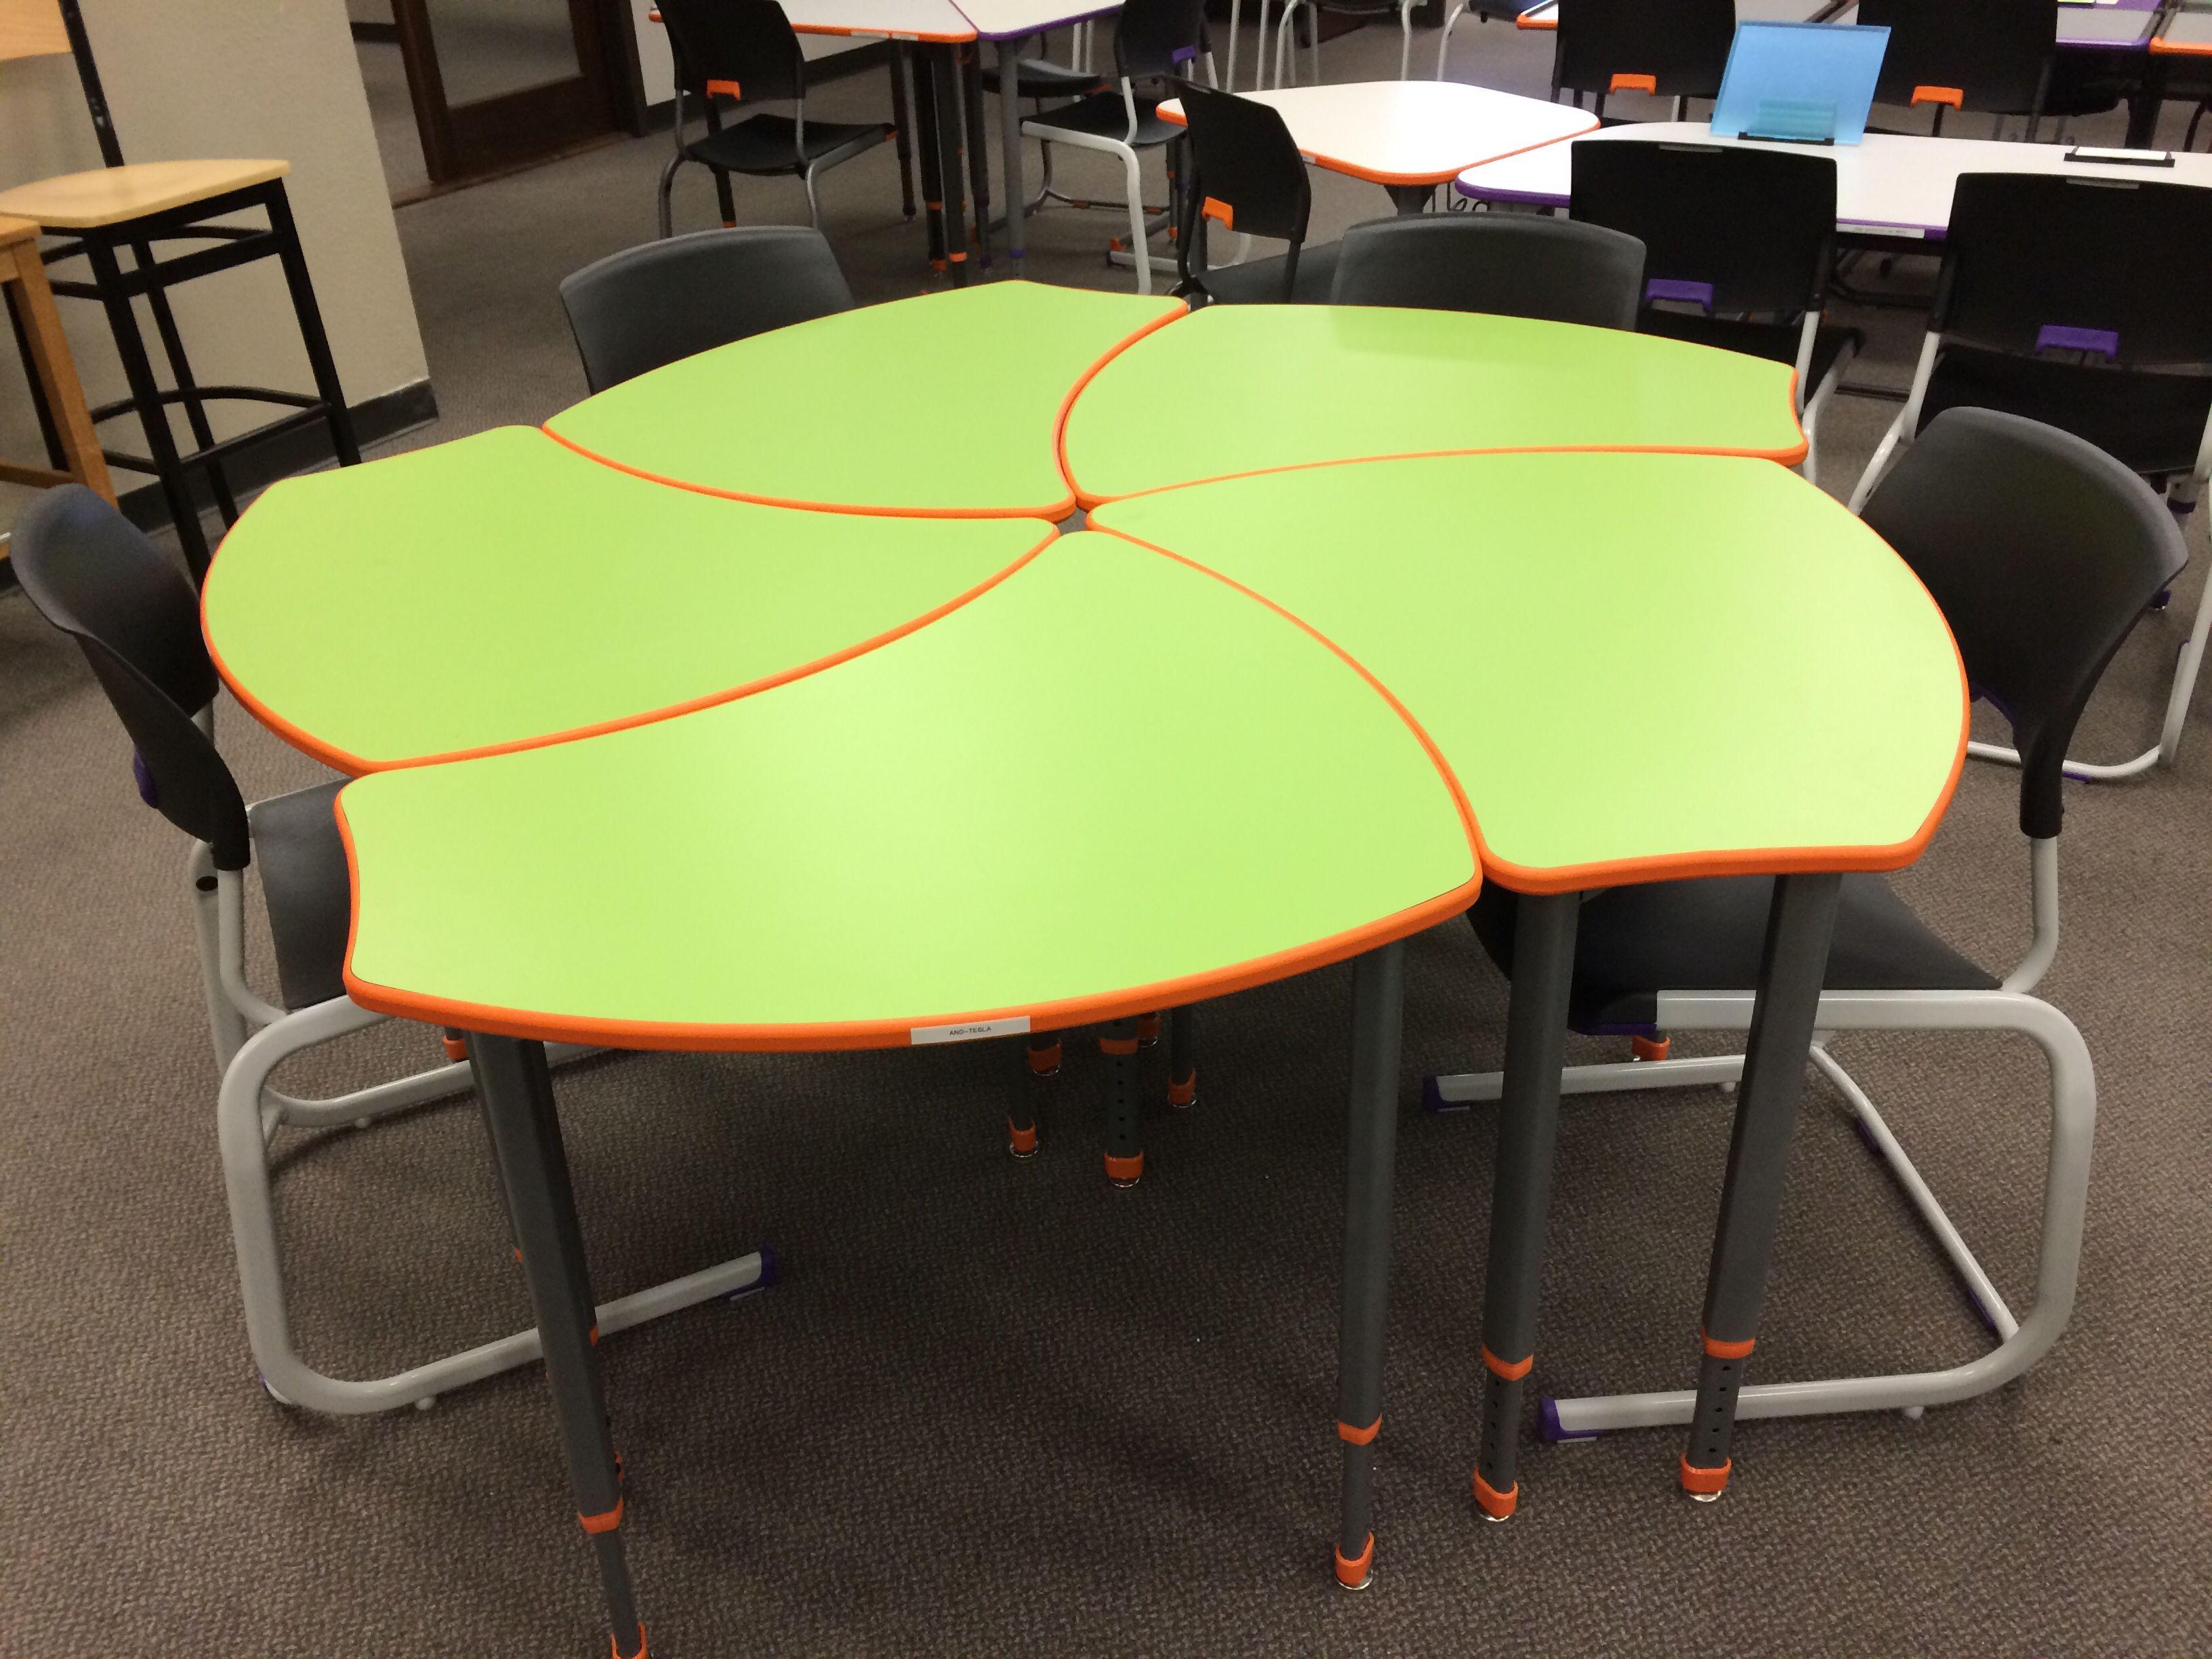 Tesla configuration by paragon. 82 best School Furniture images on Pinterest   School furniture